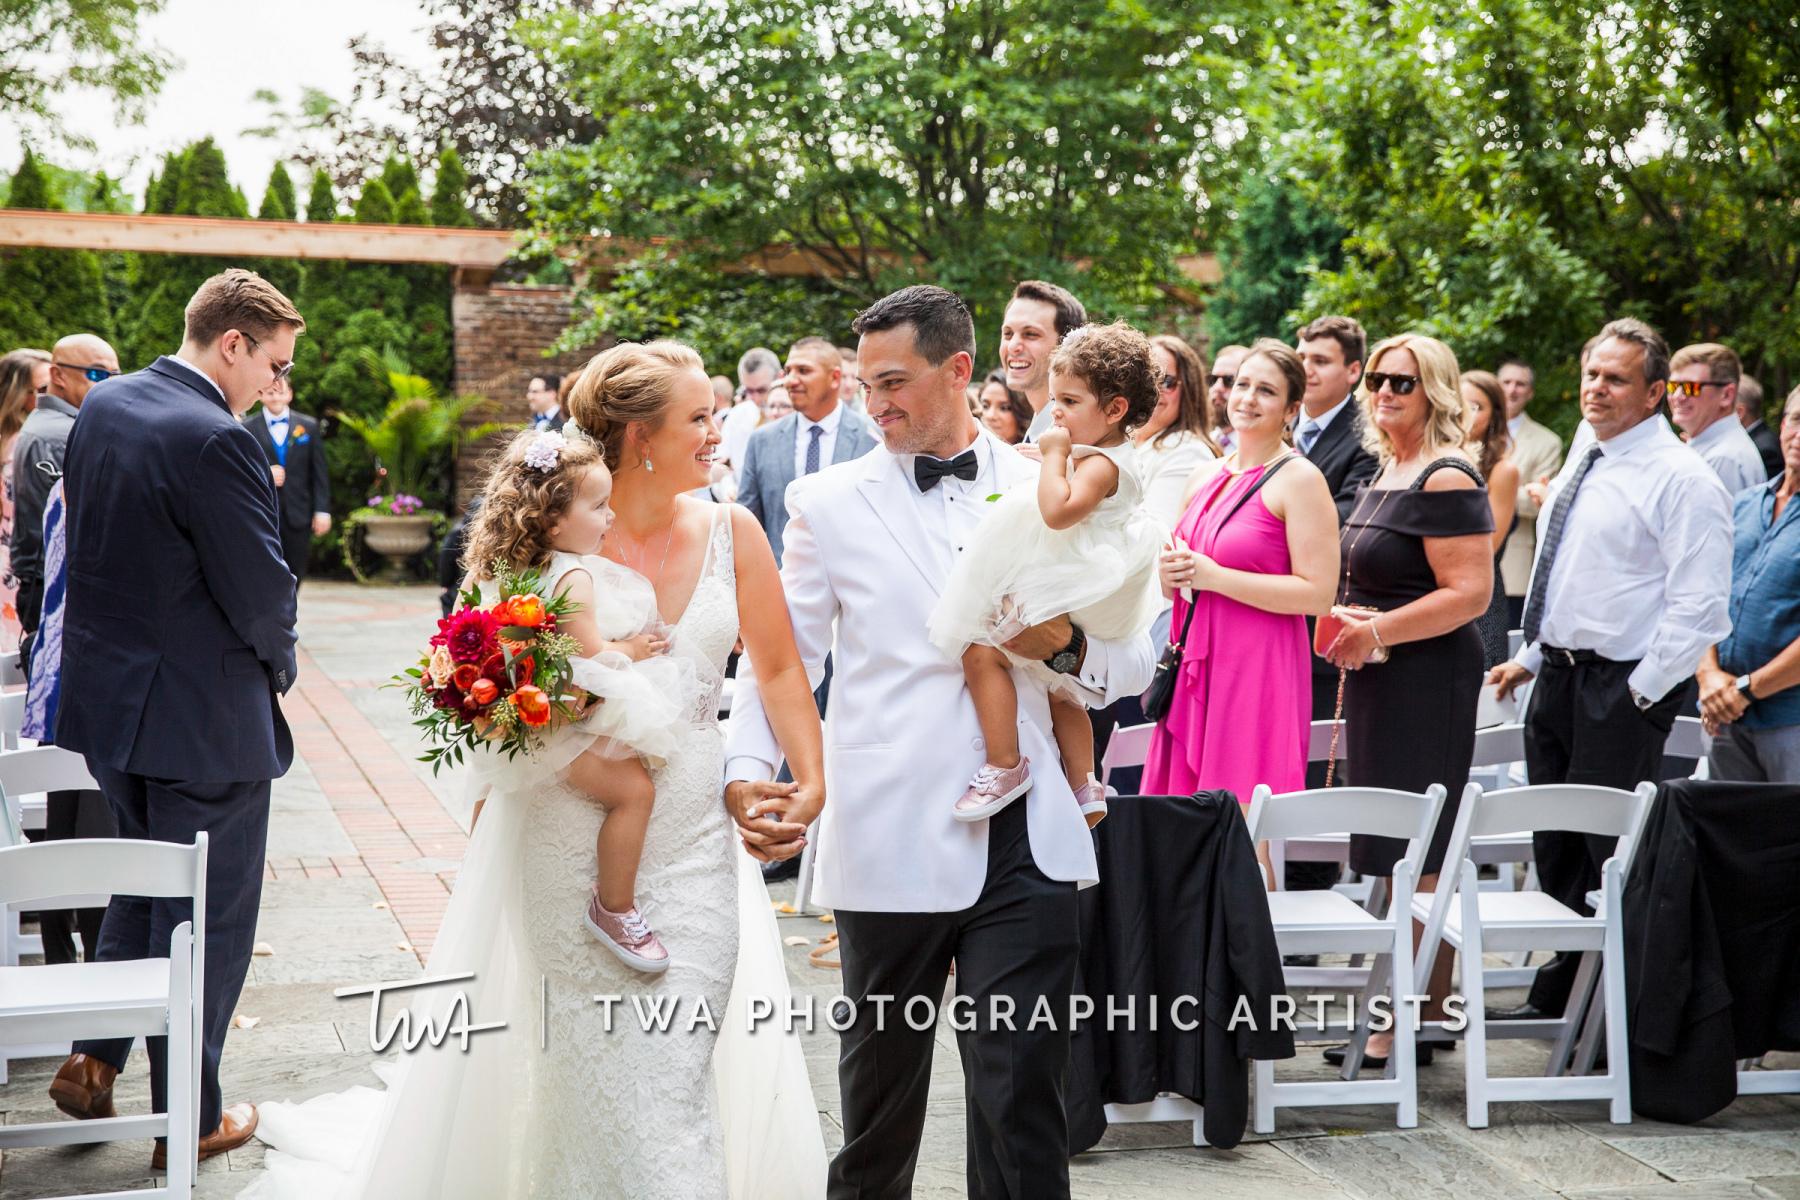 Chicago-Wedding-Photographers-Renaissance-Hotel_Hohensee_Fleishman_JG_DK-034-1180